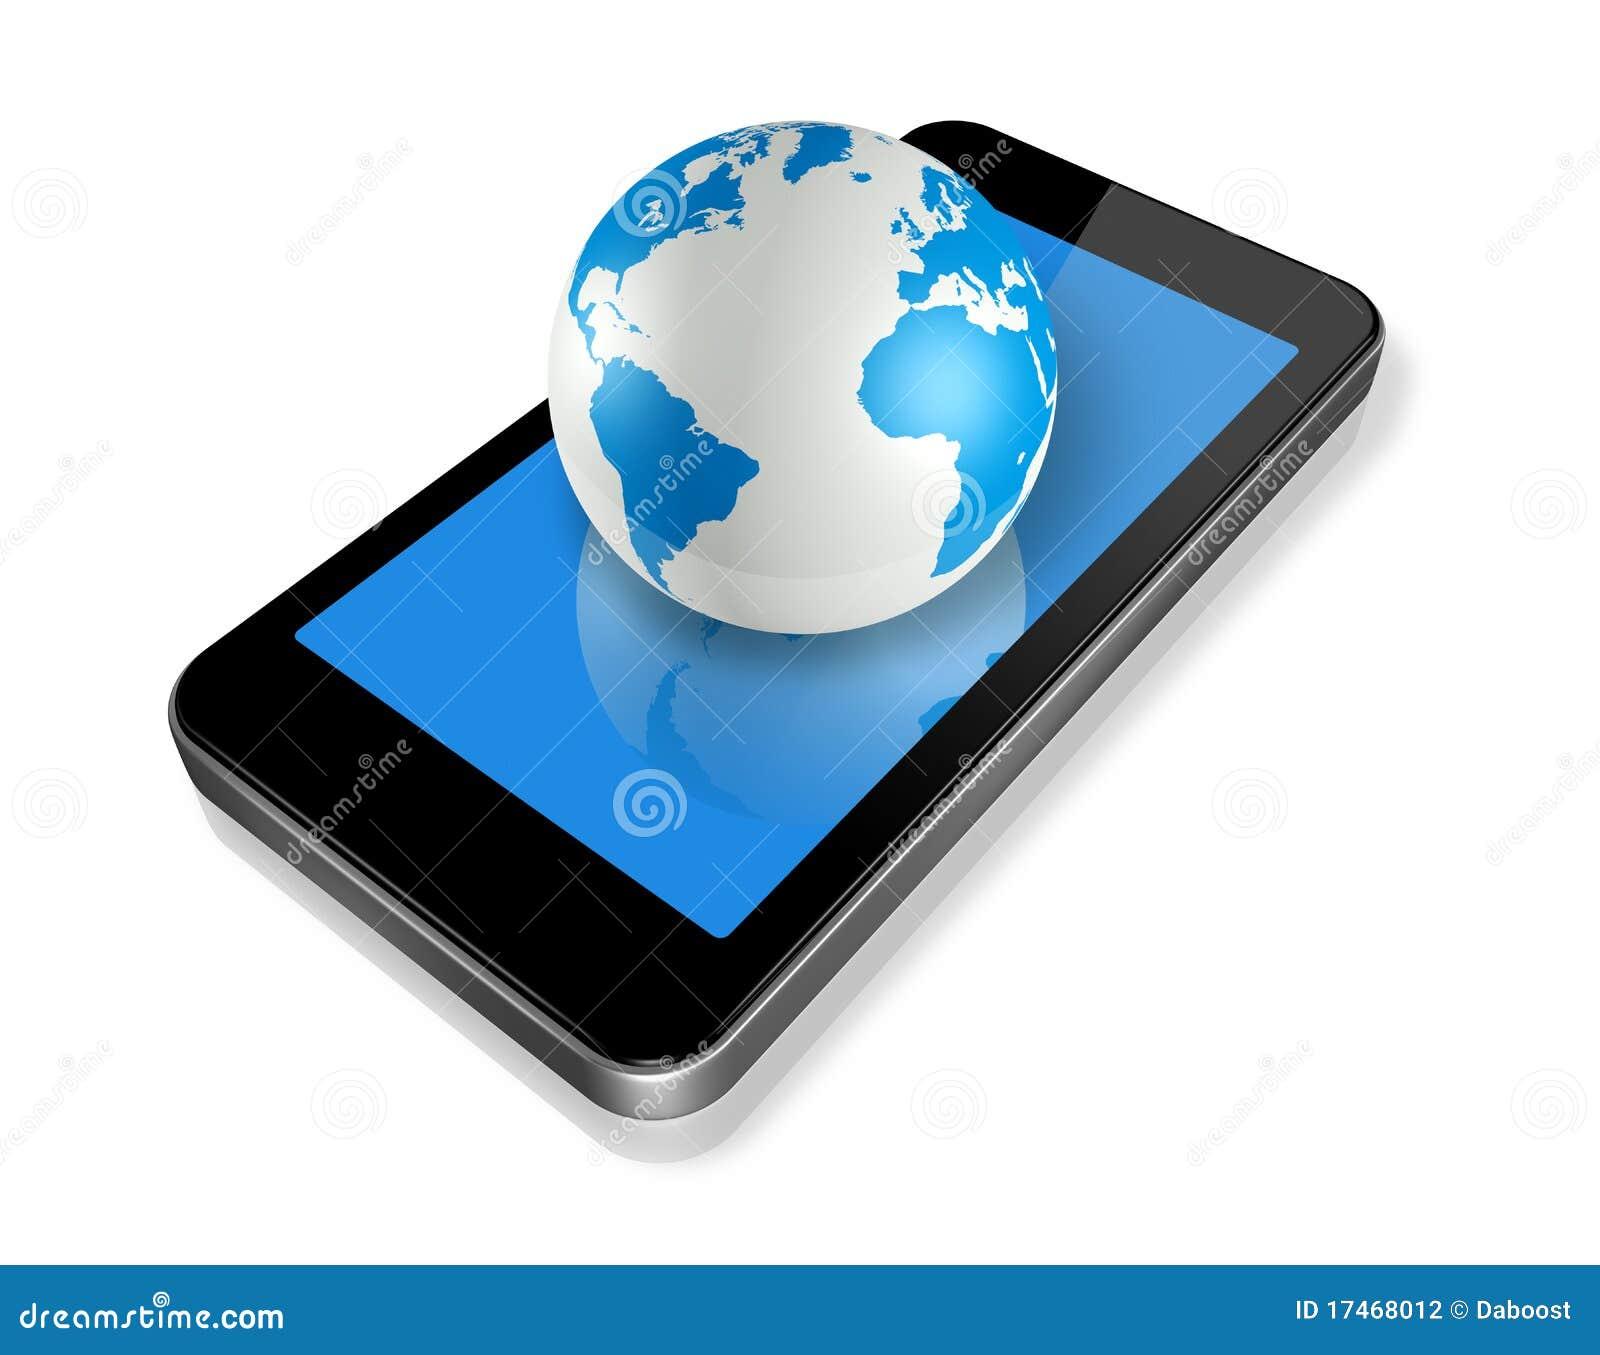 Mobiele telefoon en wereldbol stock illustratie - Maastricht mobel ...